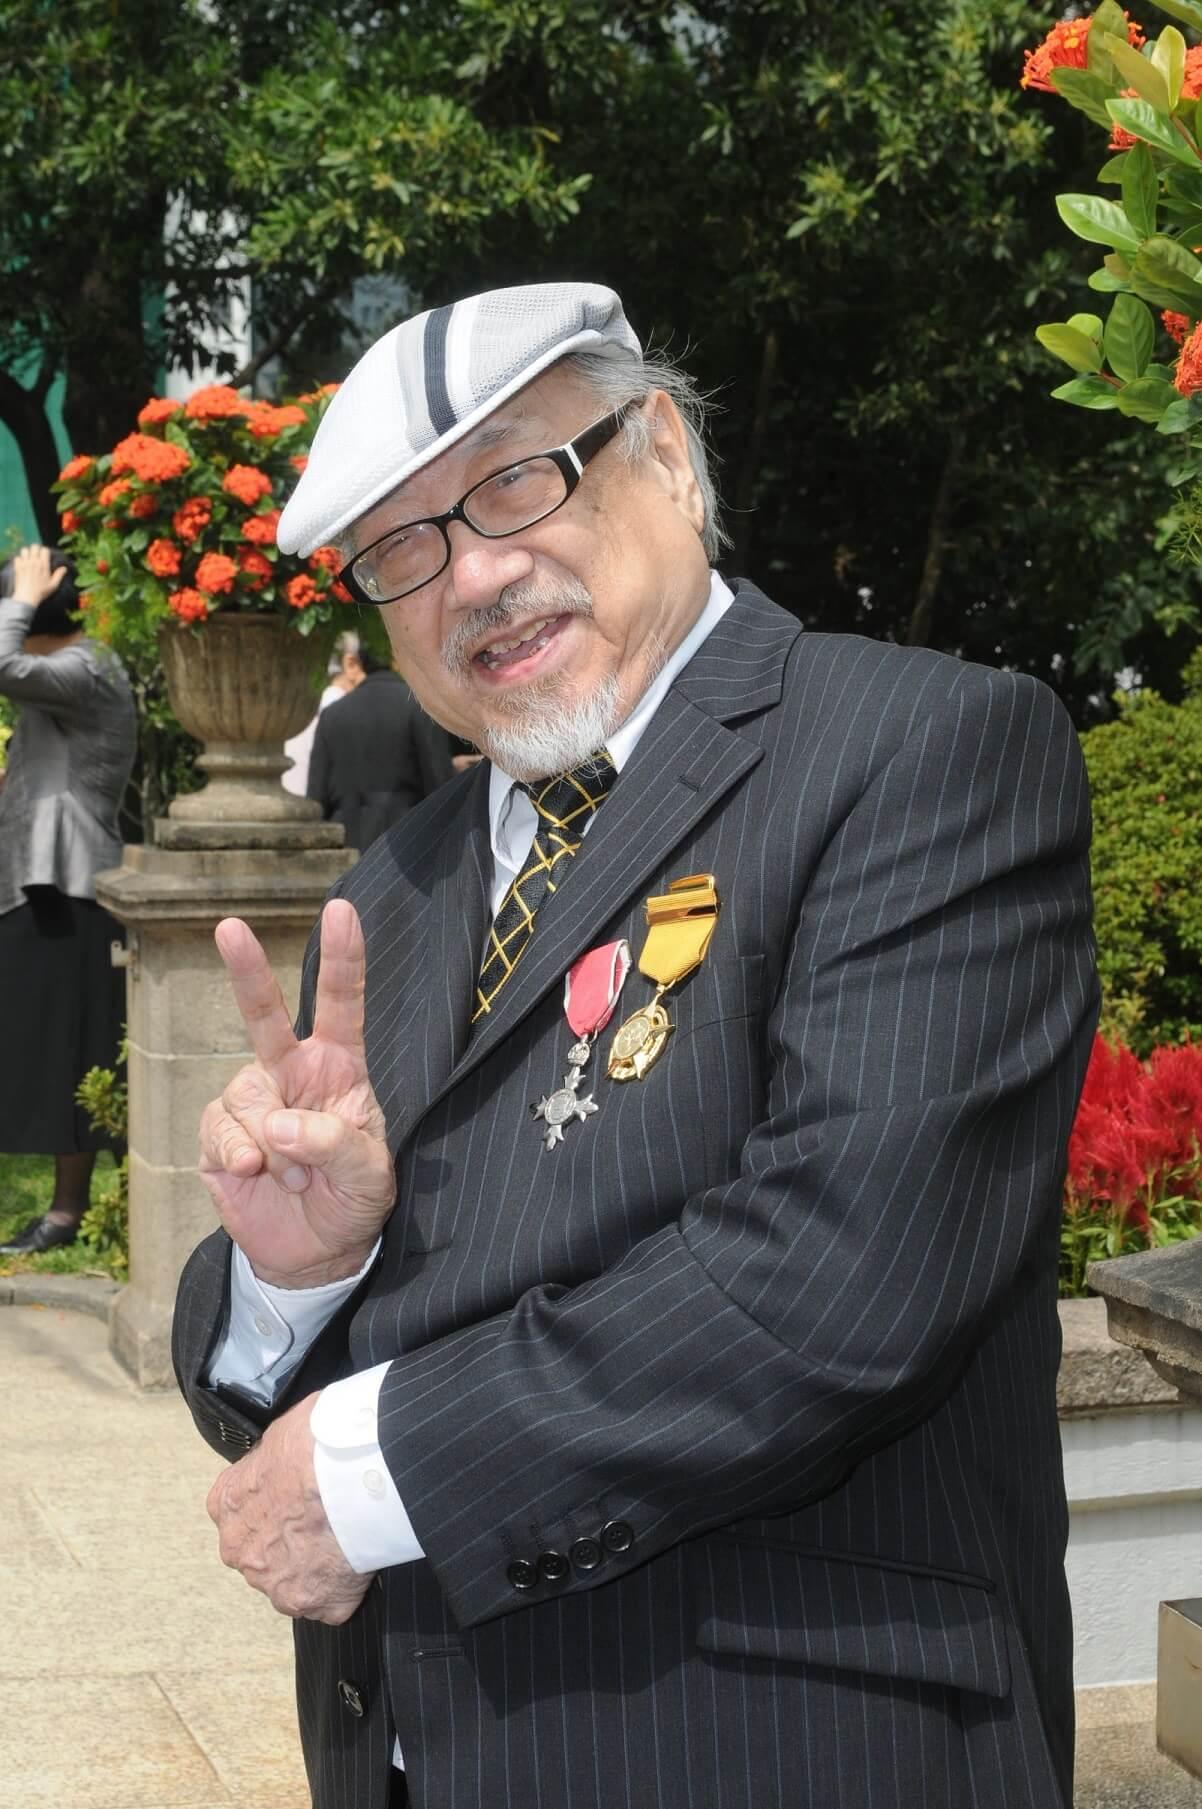 Uncle Ray於2008年獲香港特區政府頒發銅紫荊星章